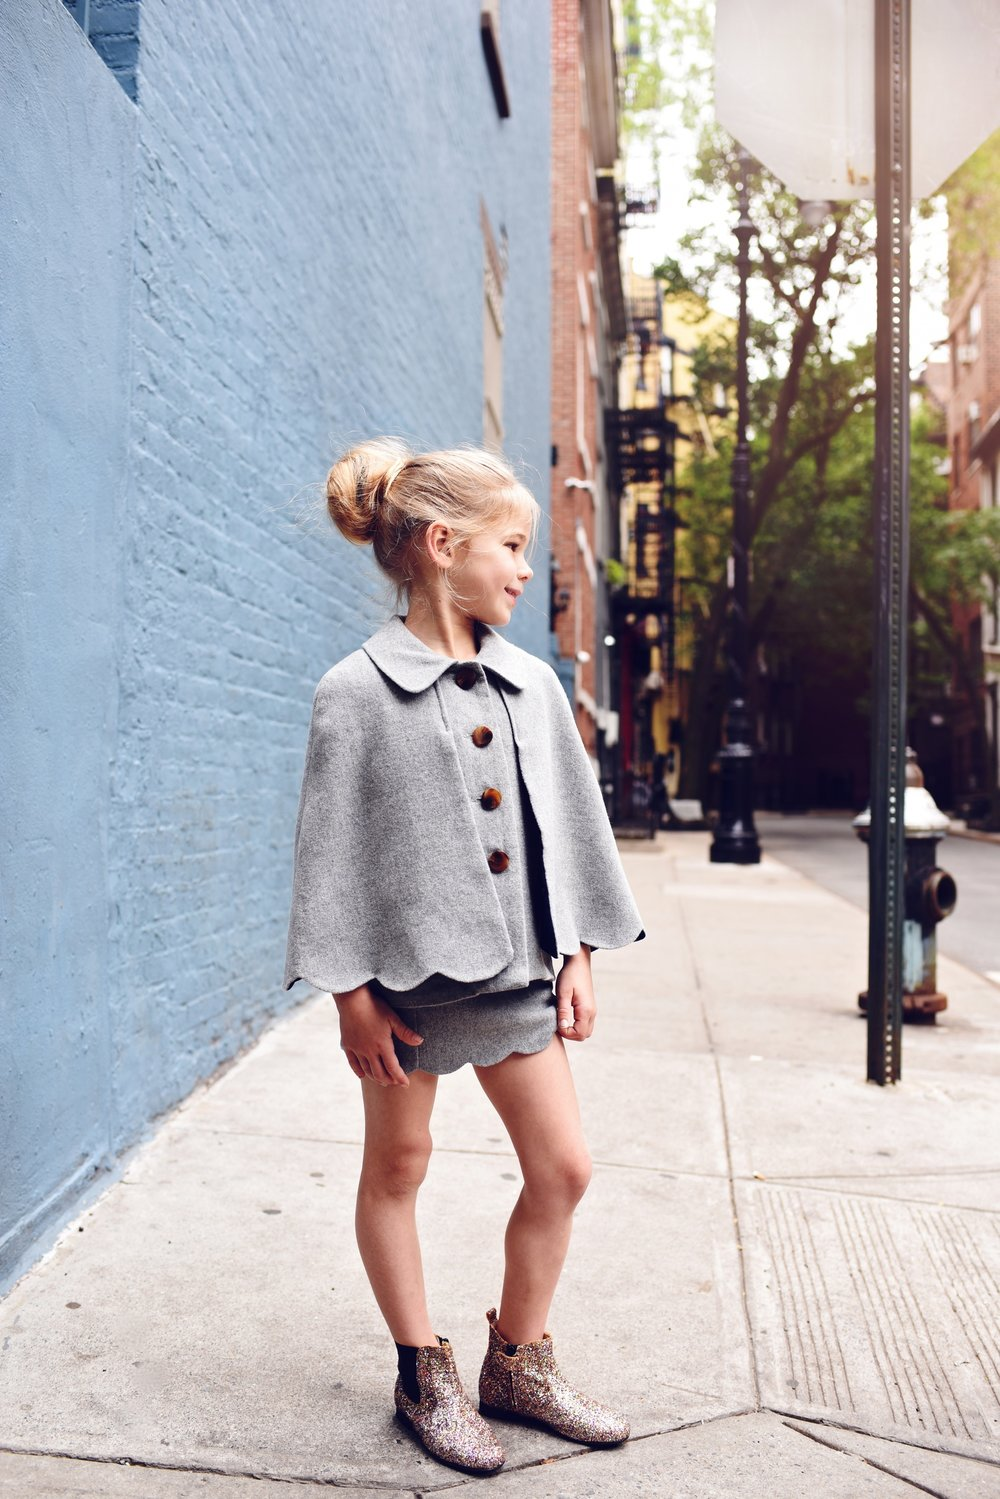 Enfant+Street+Style+by+Gina+Kim+Photography+Hucklebones+dress.jpeg